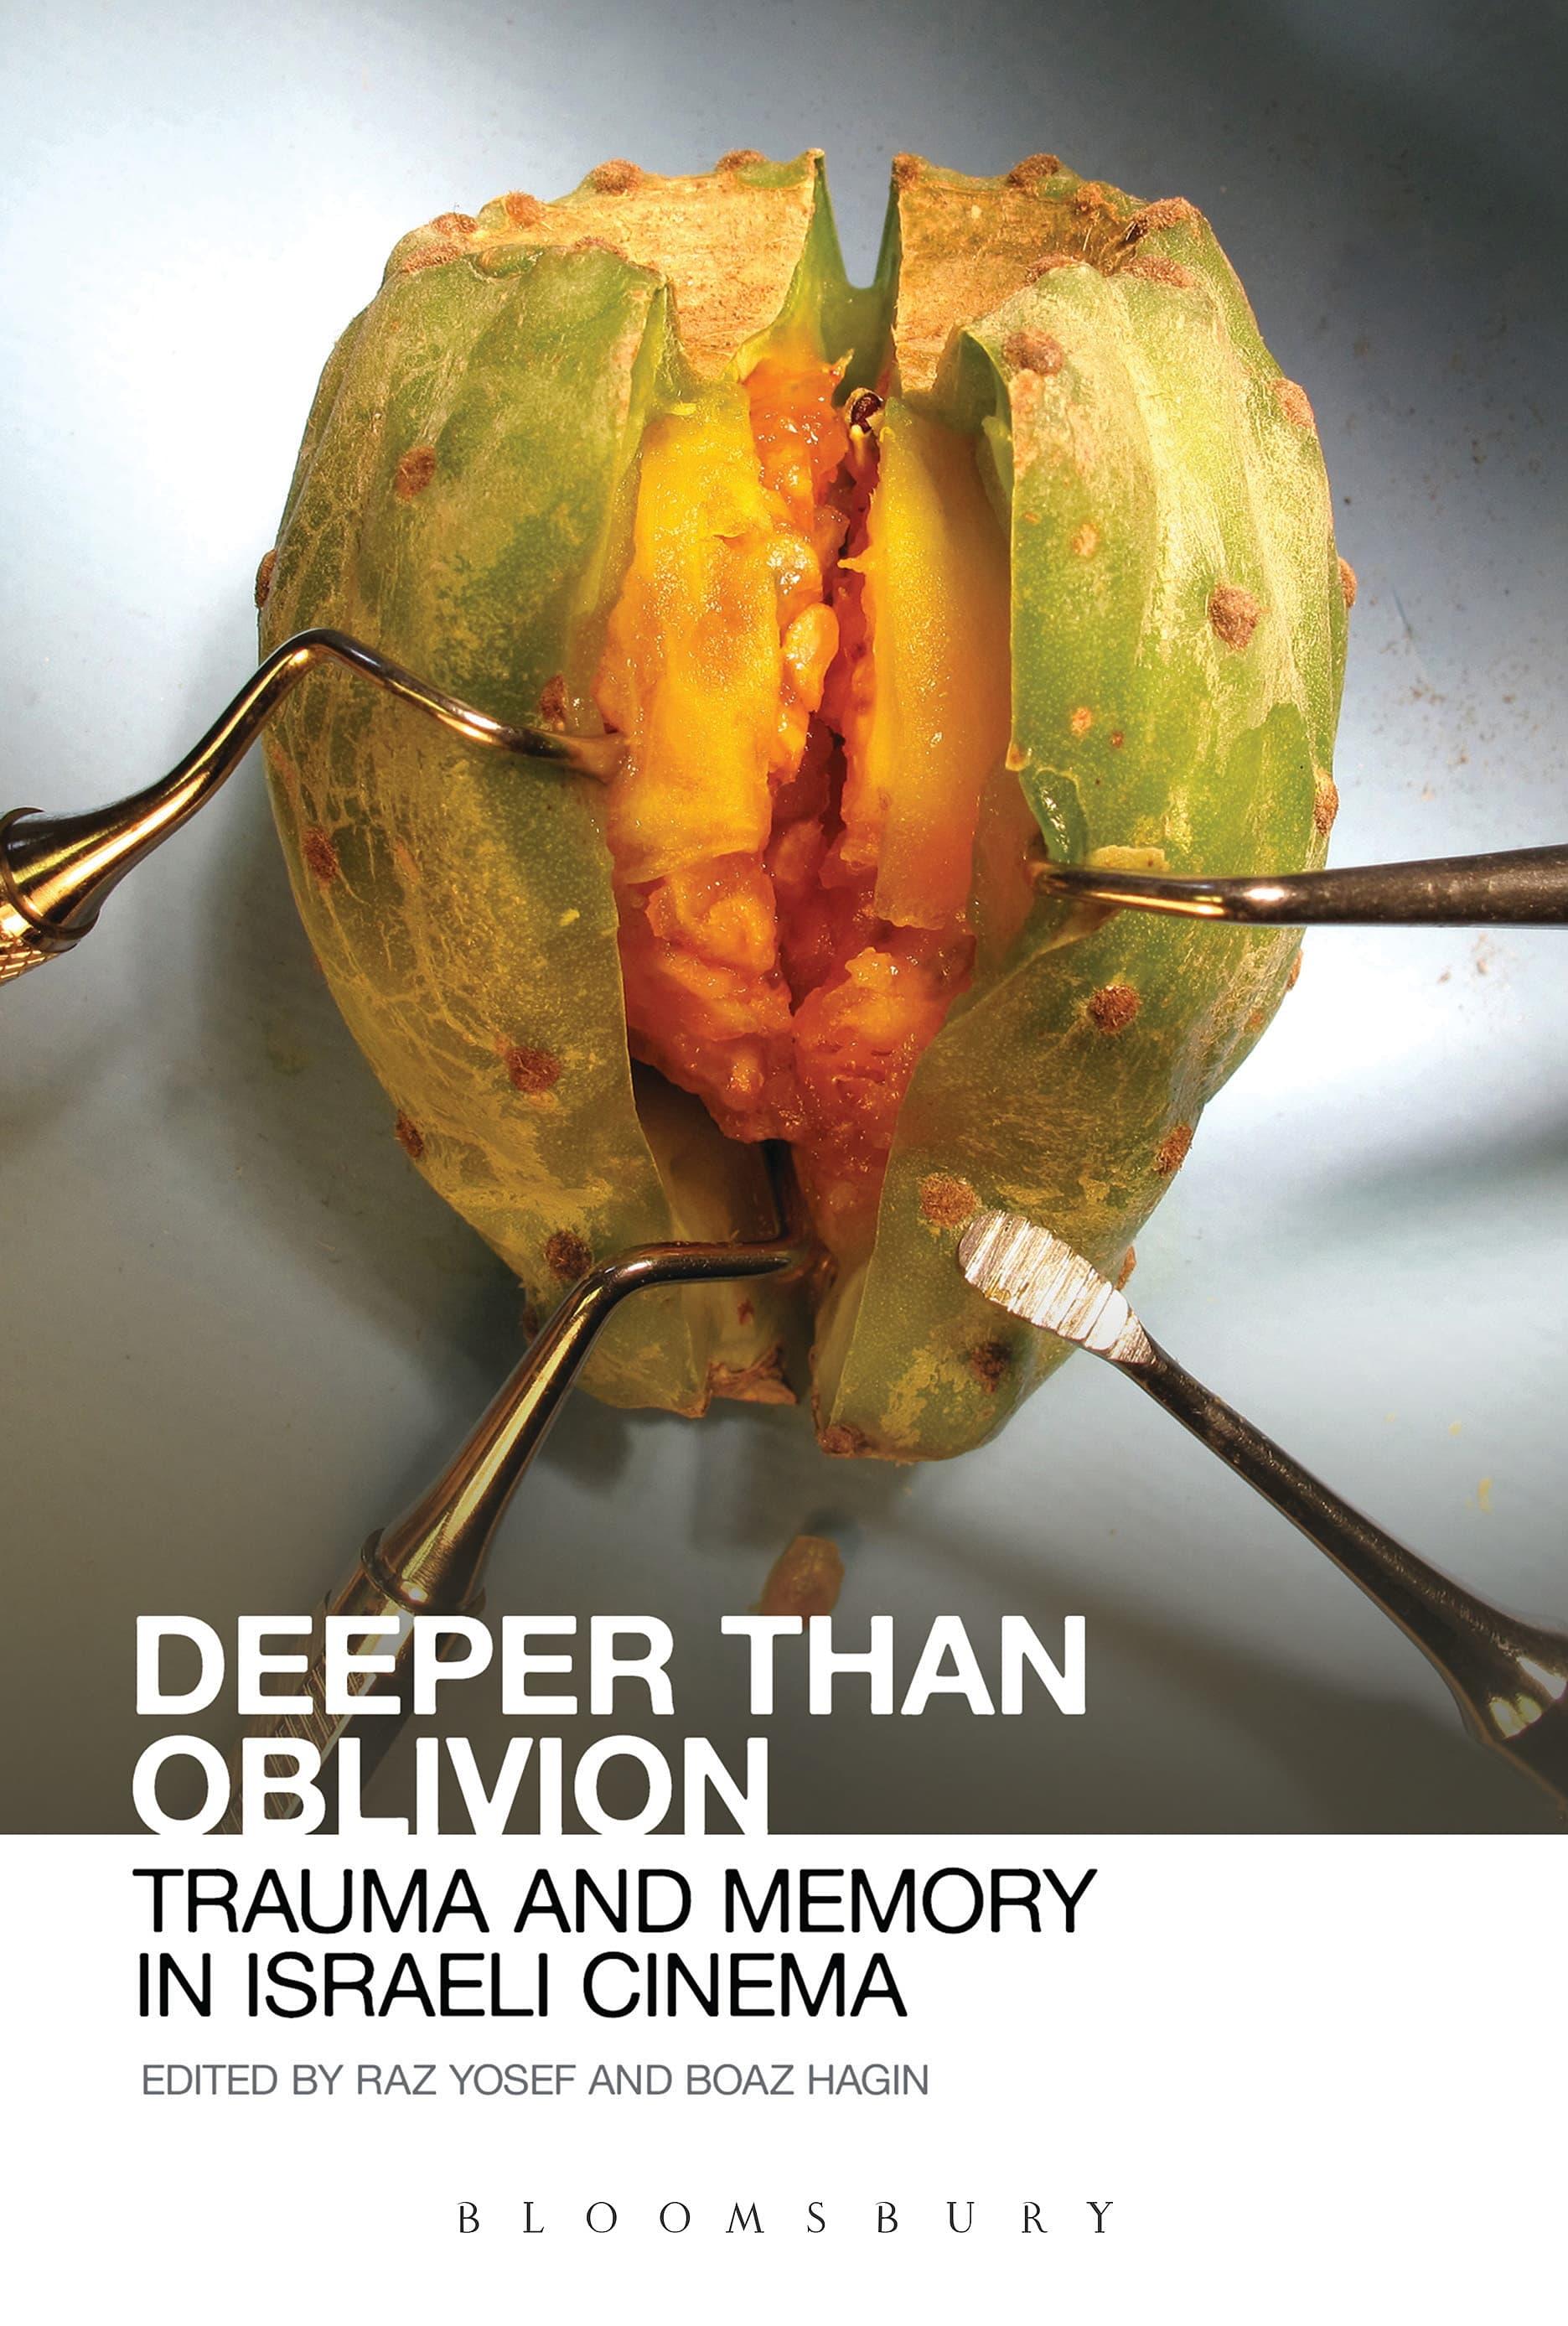 Deeper than Oblivion